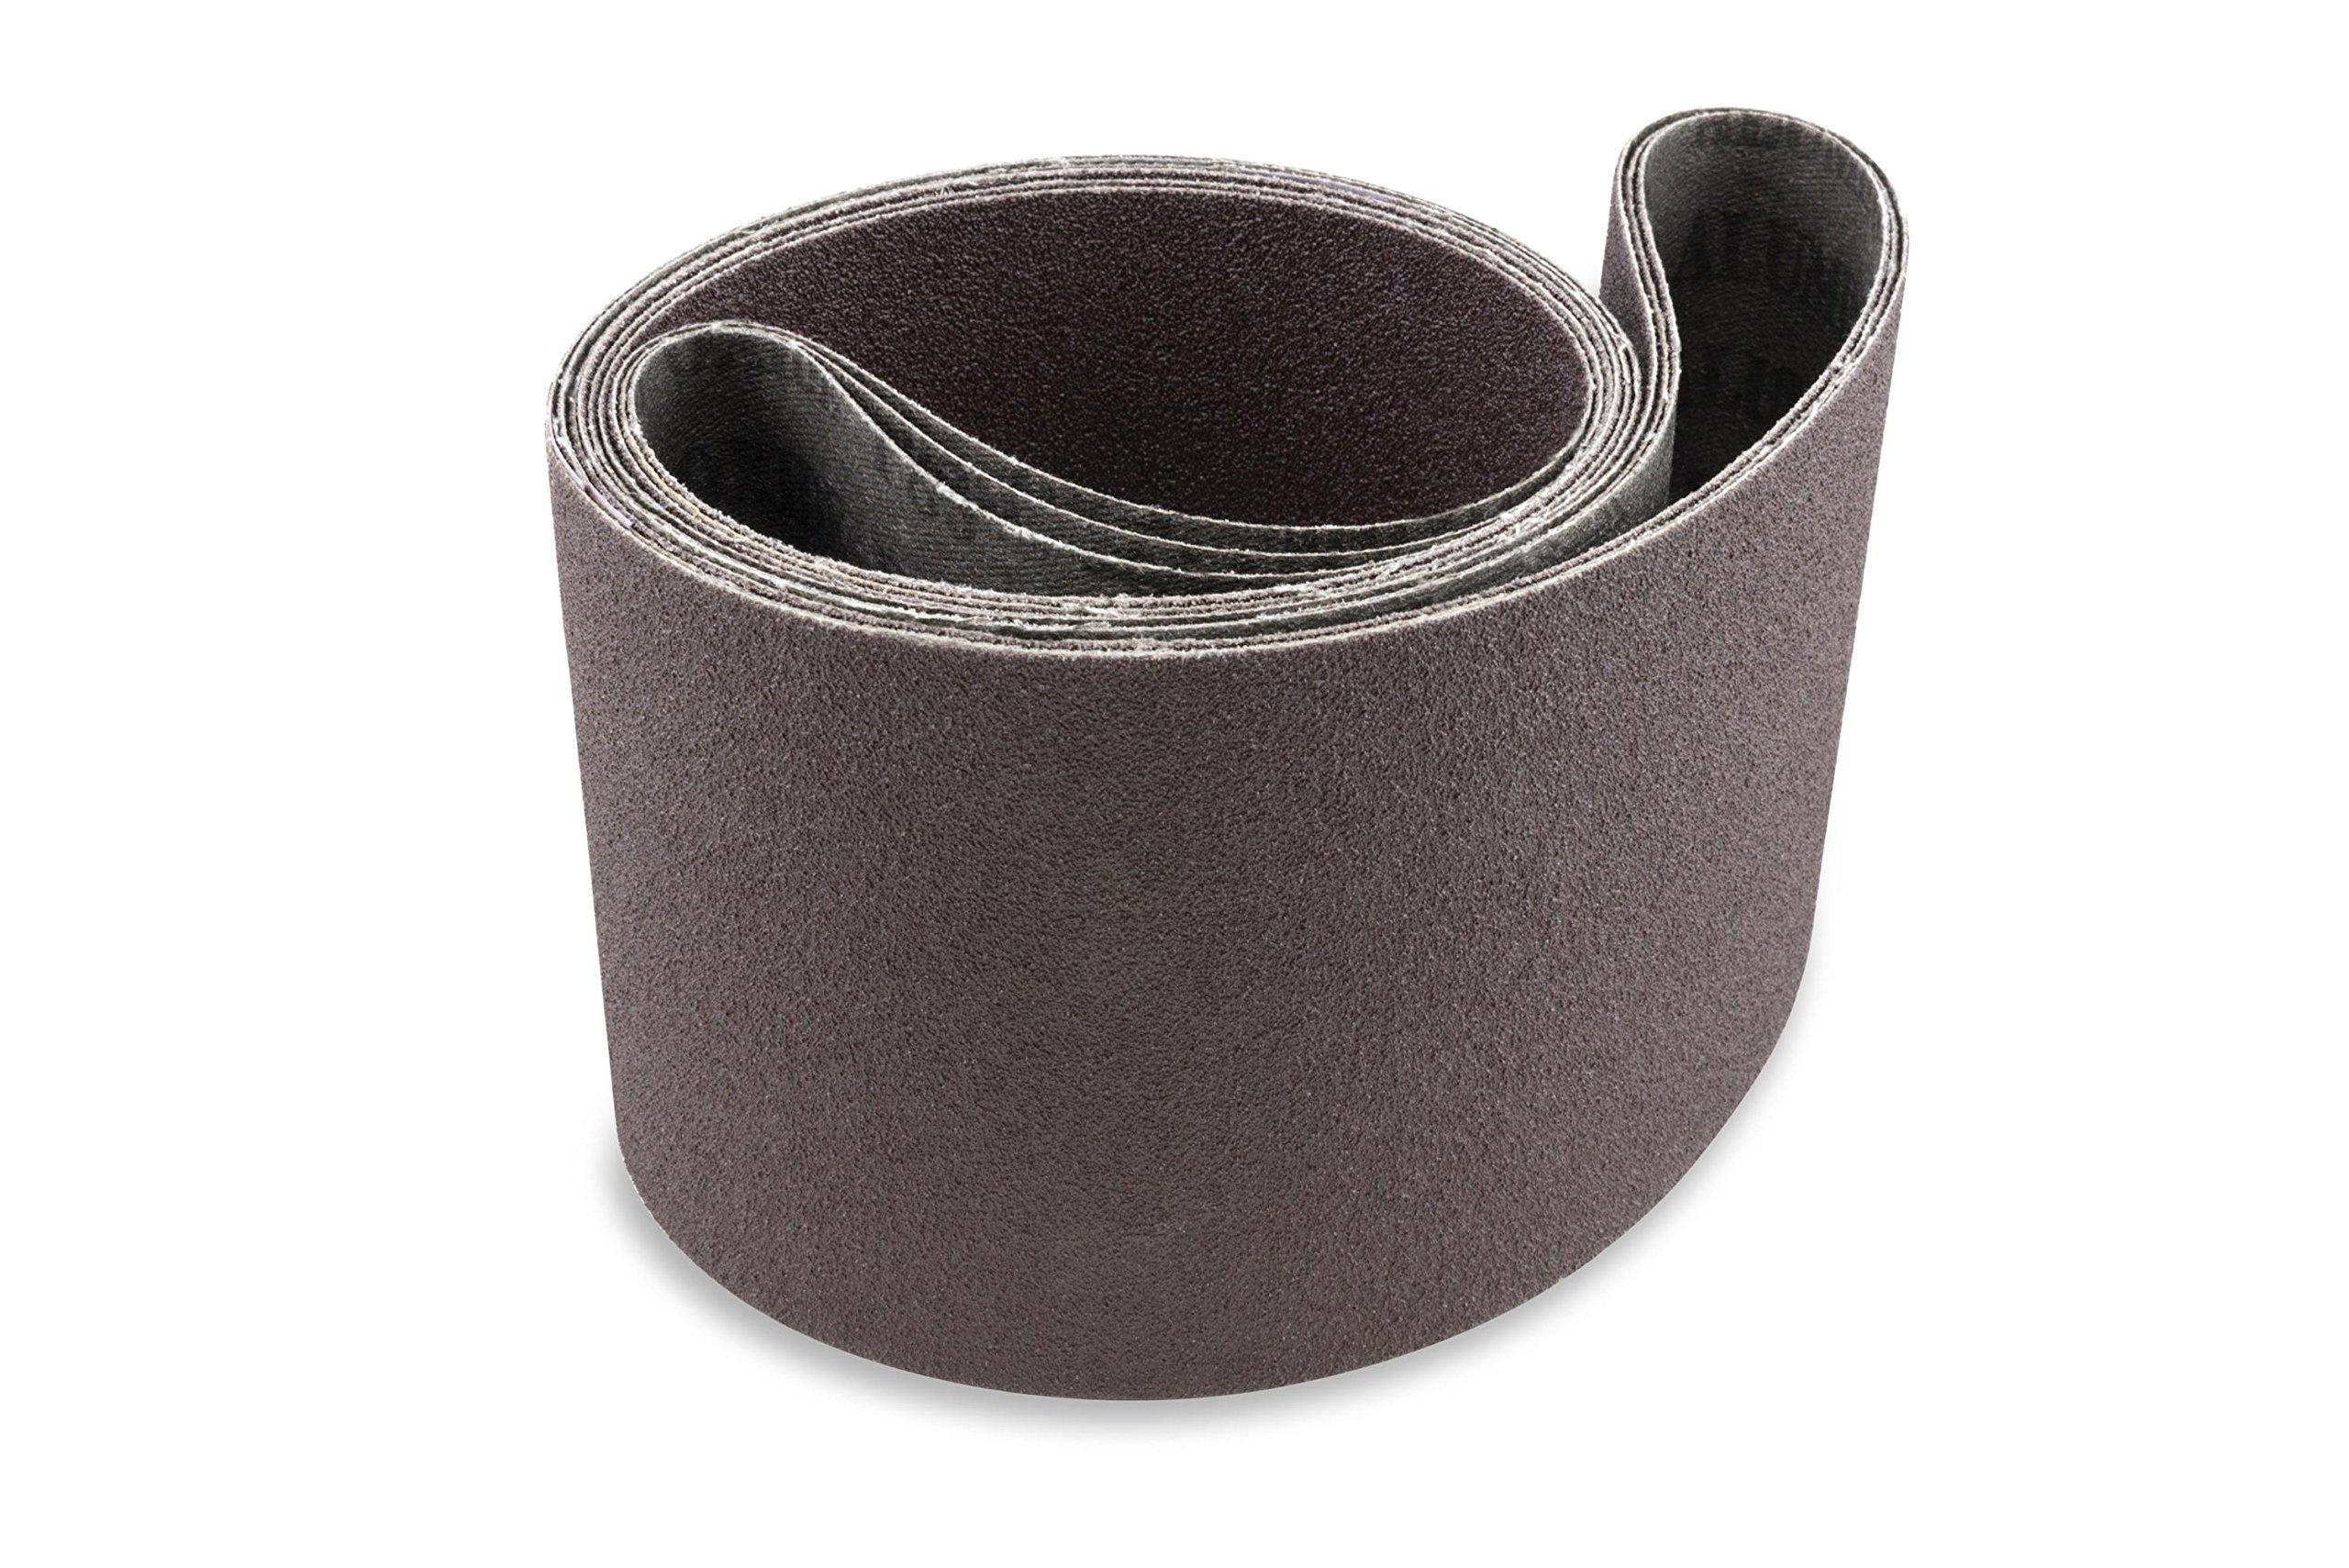 6 X 89 inch 80 Grit Aluminum Oxide Multipurpose Sanding Belts, 2 Pack